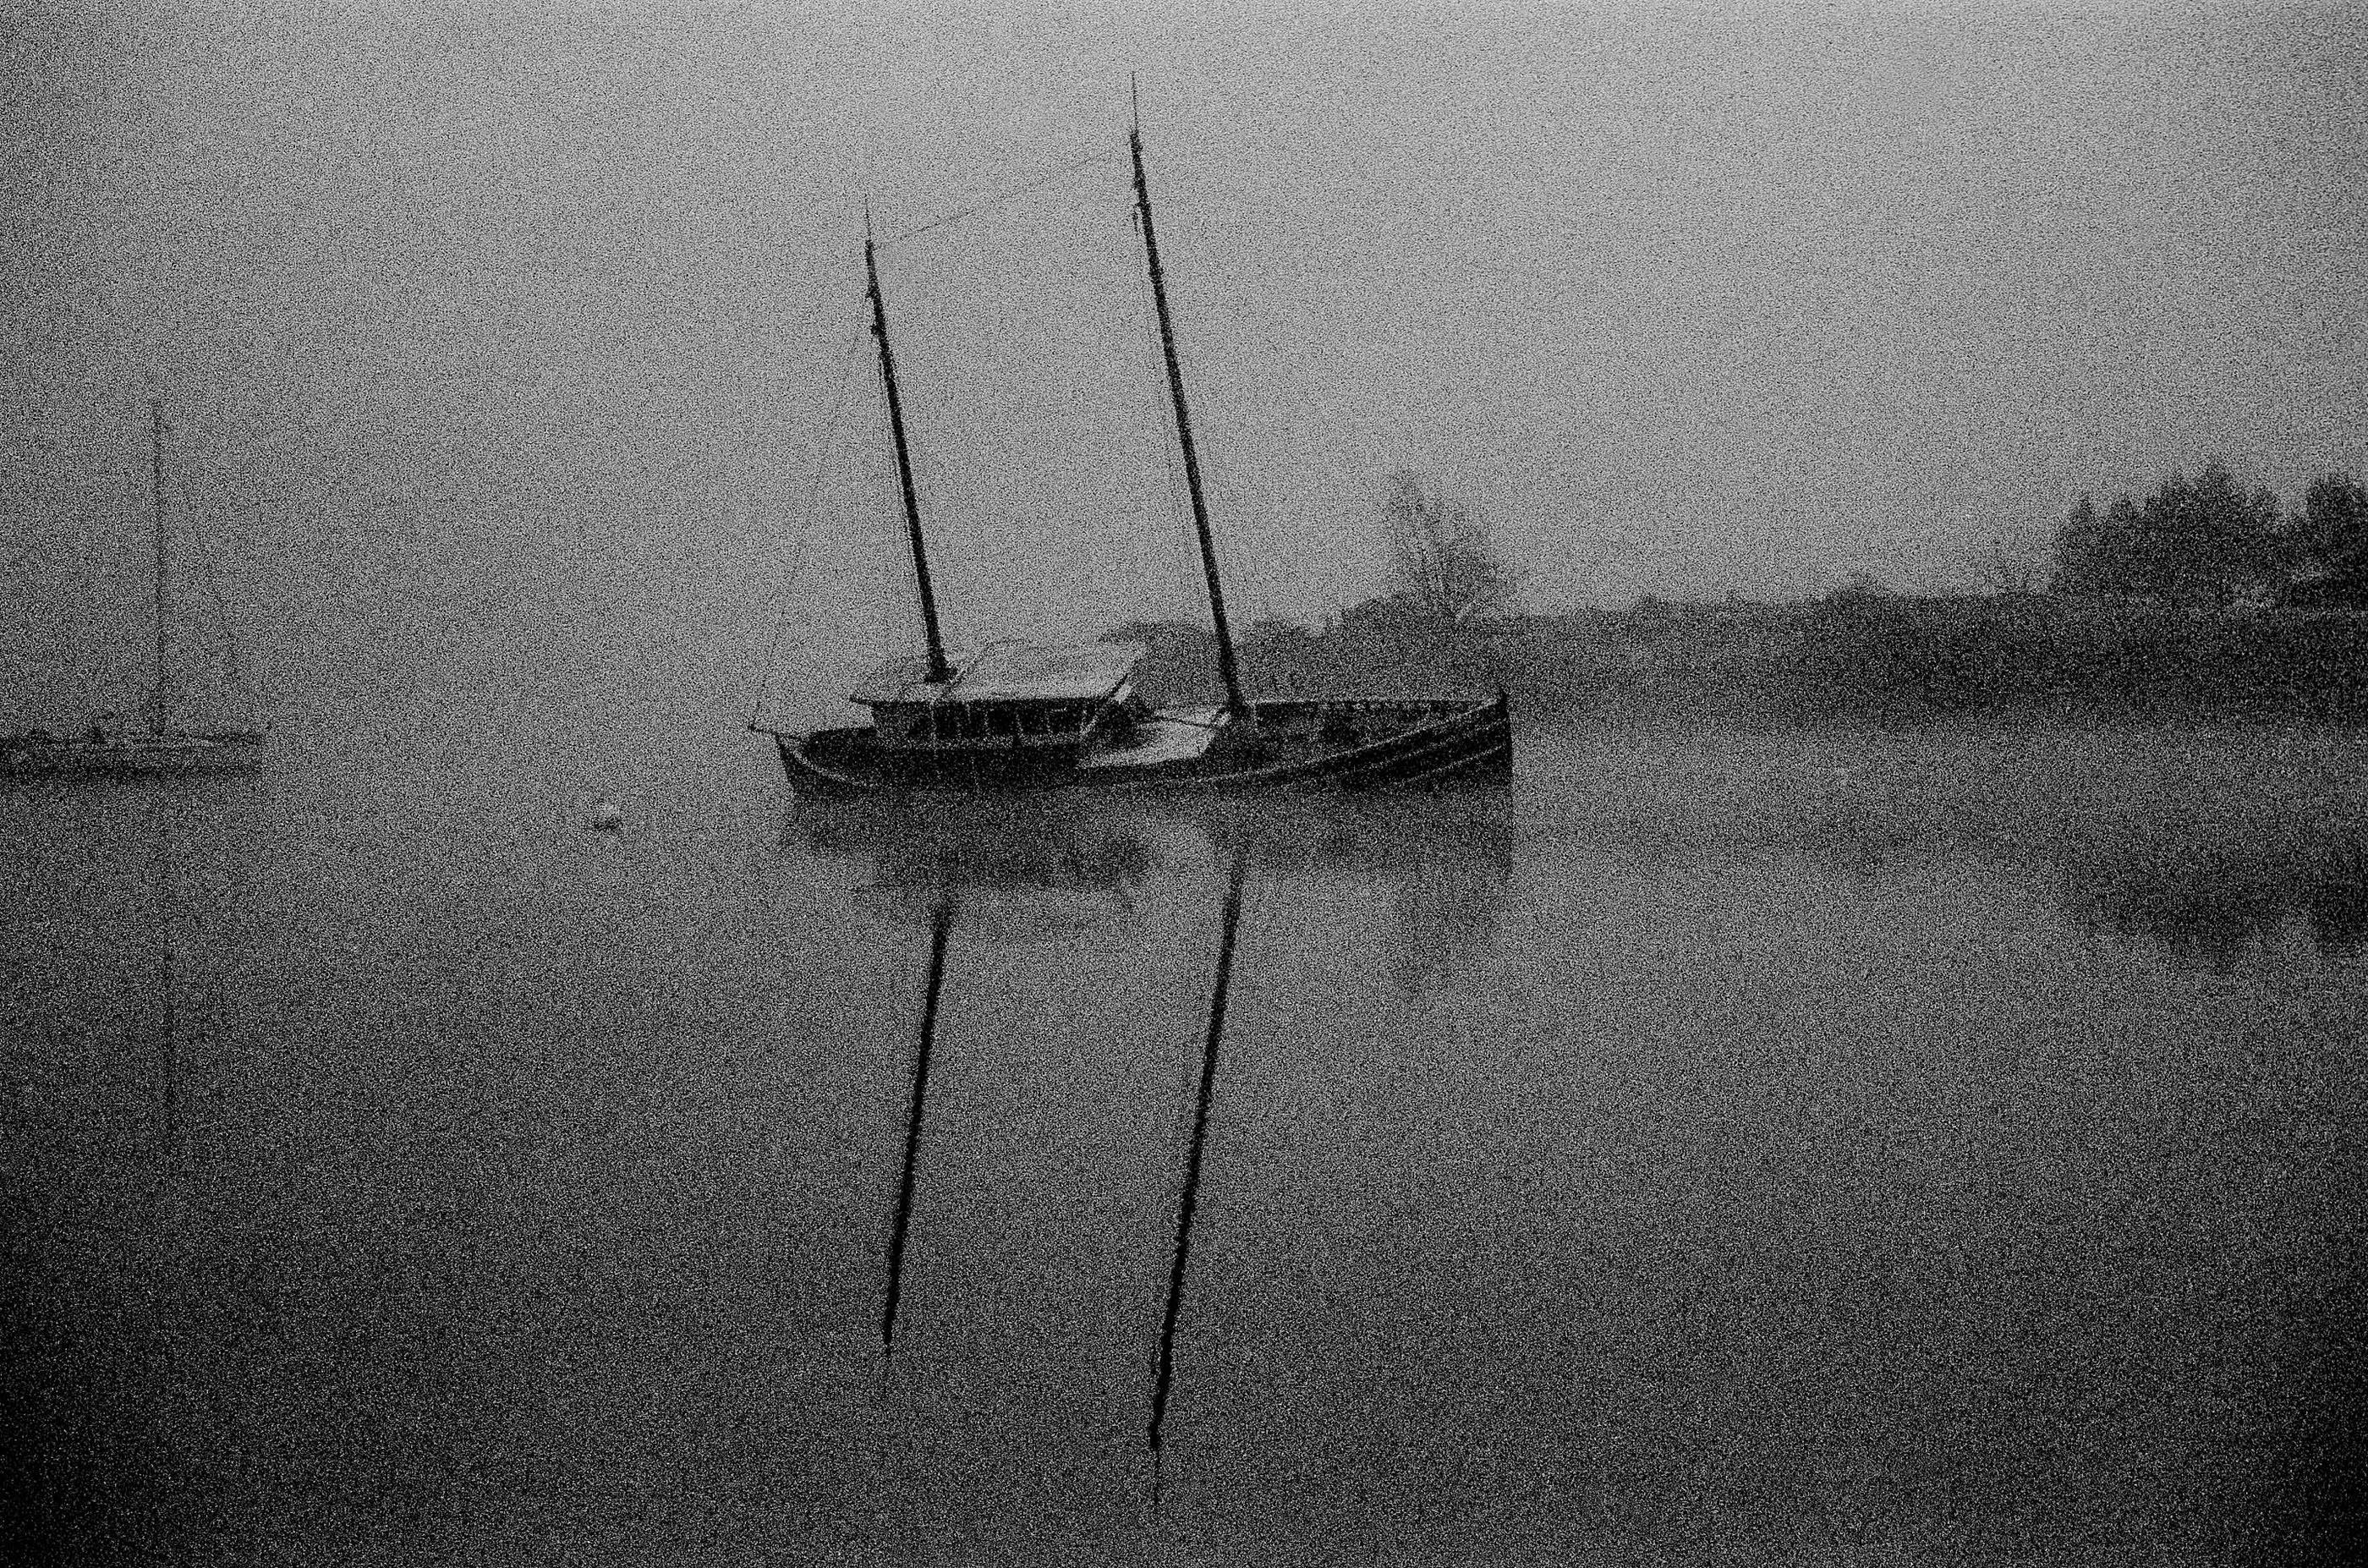 Loch Ness Lilting Boat